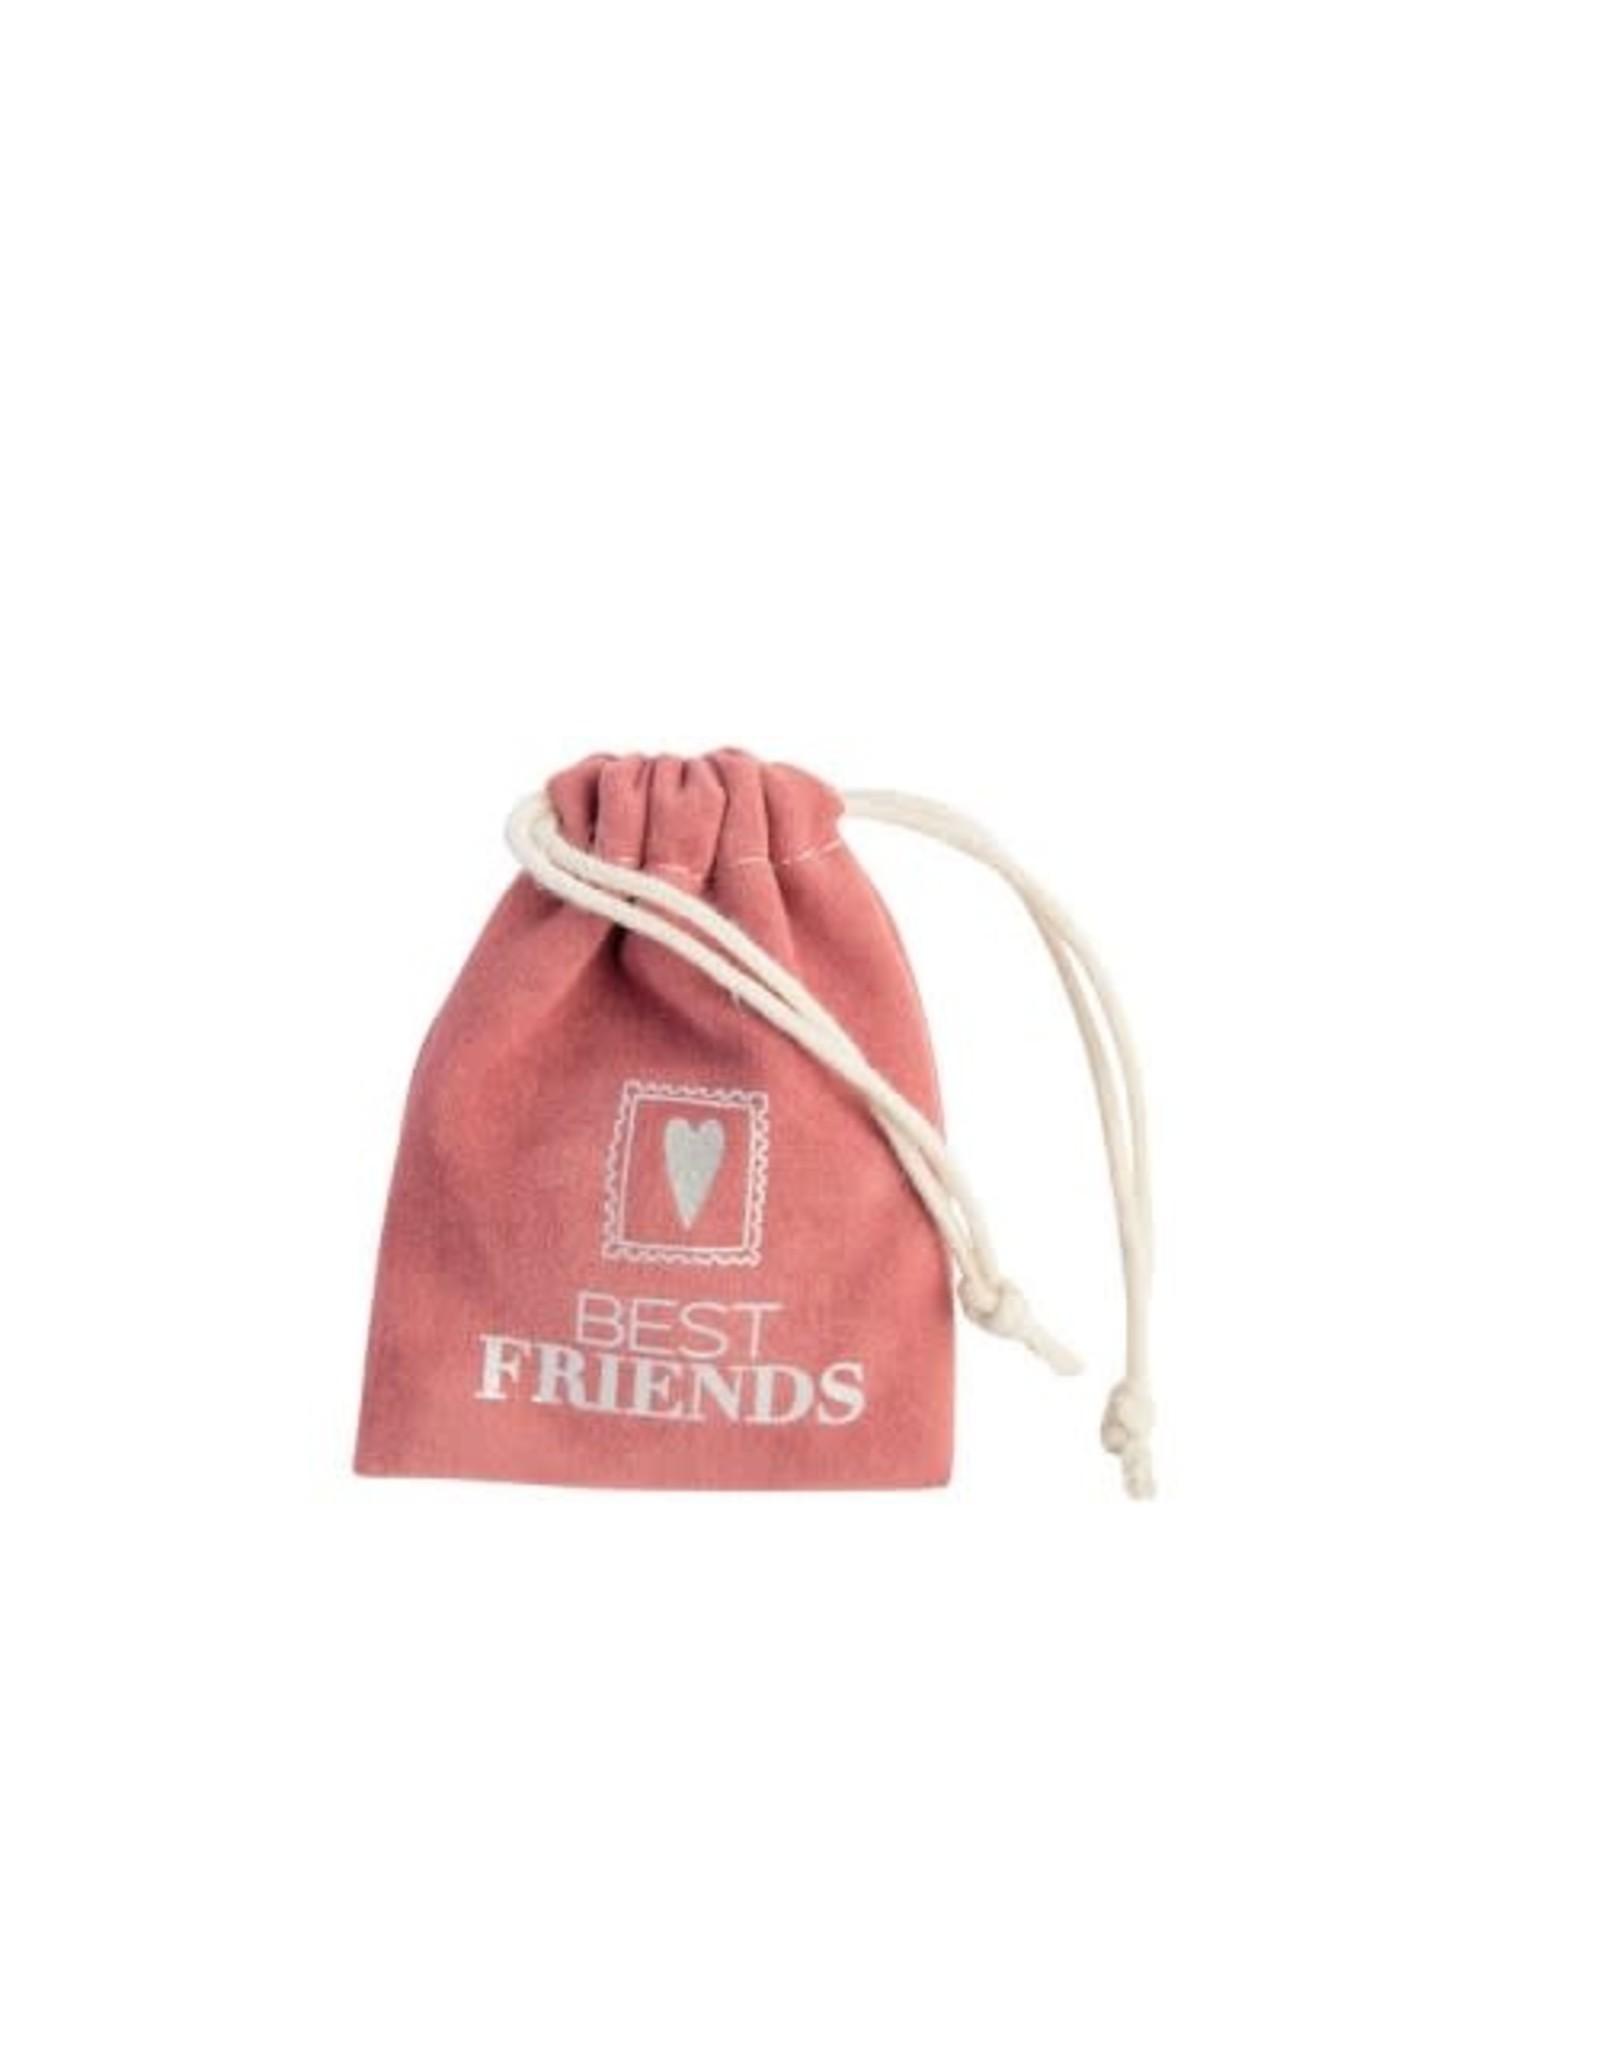 Raeder Small pocket companion Best Friends (roze)